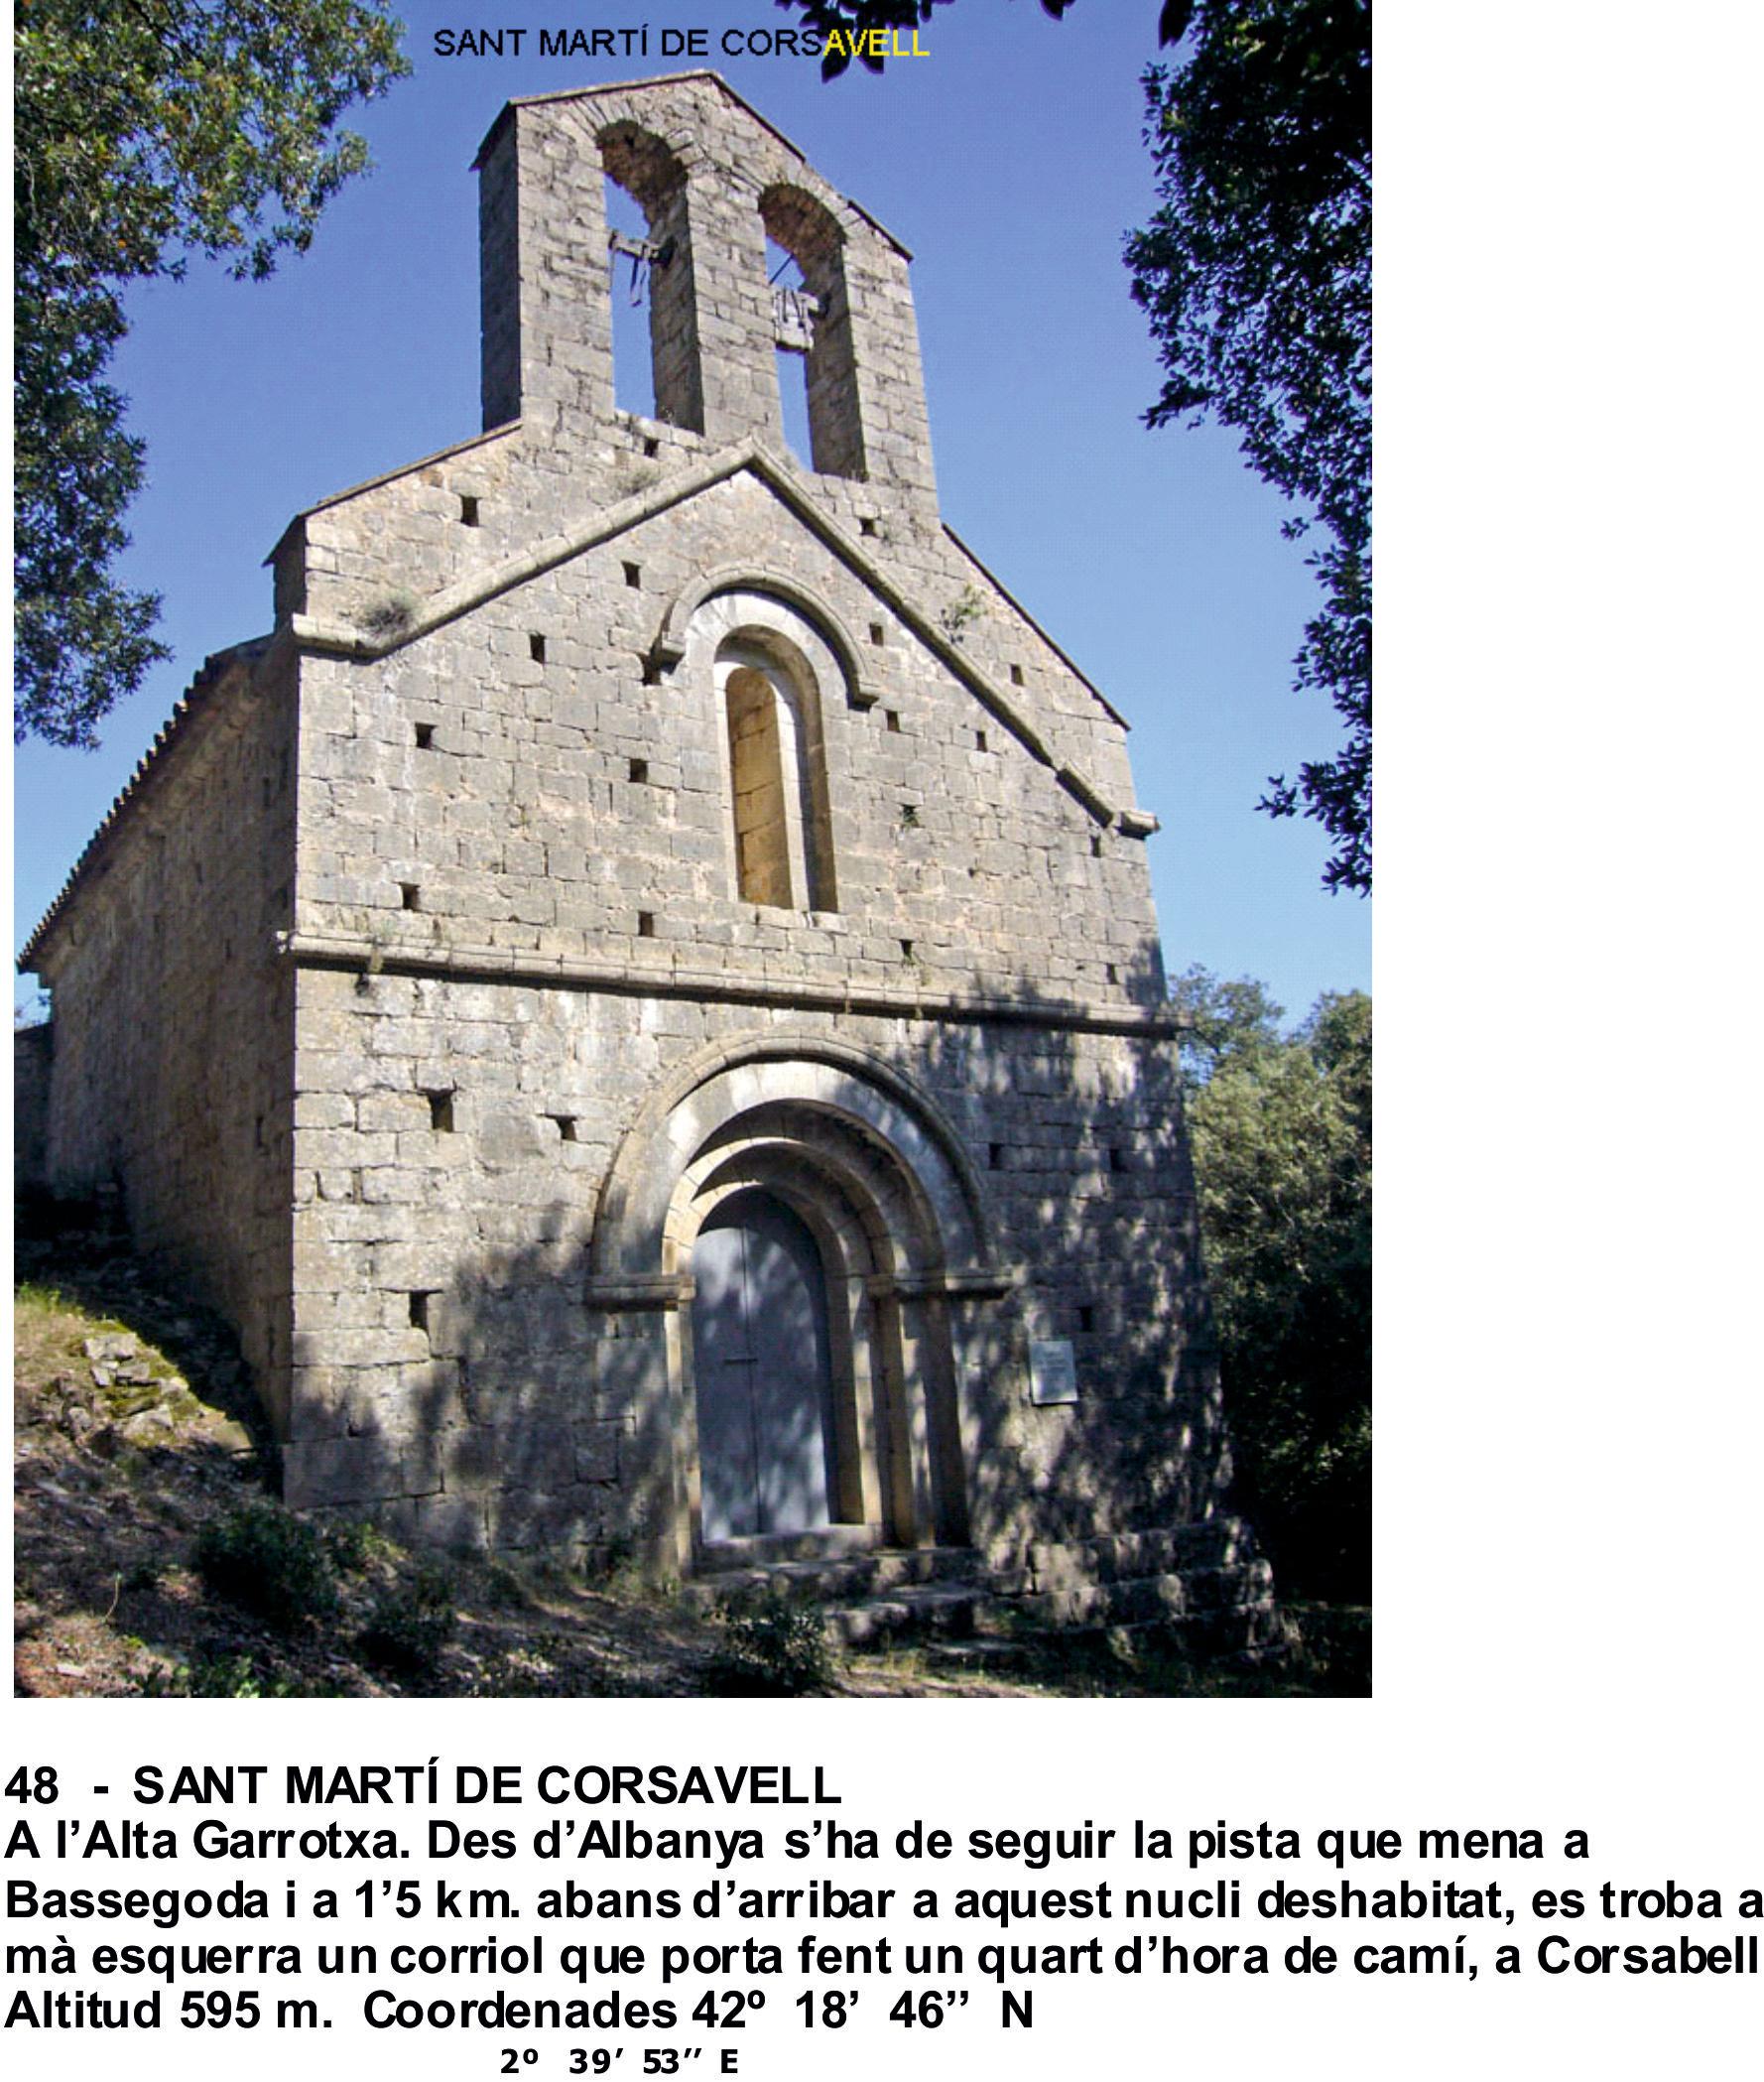 48__-__SANT_MARTÍ_DE_CORSAVELL